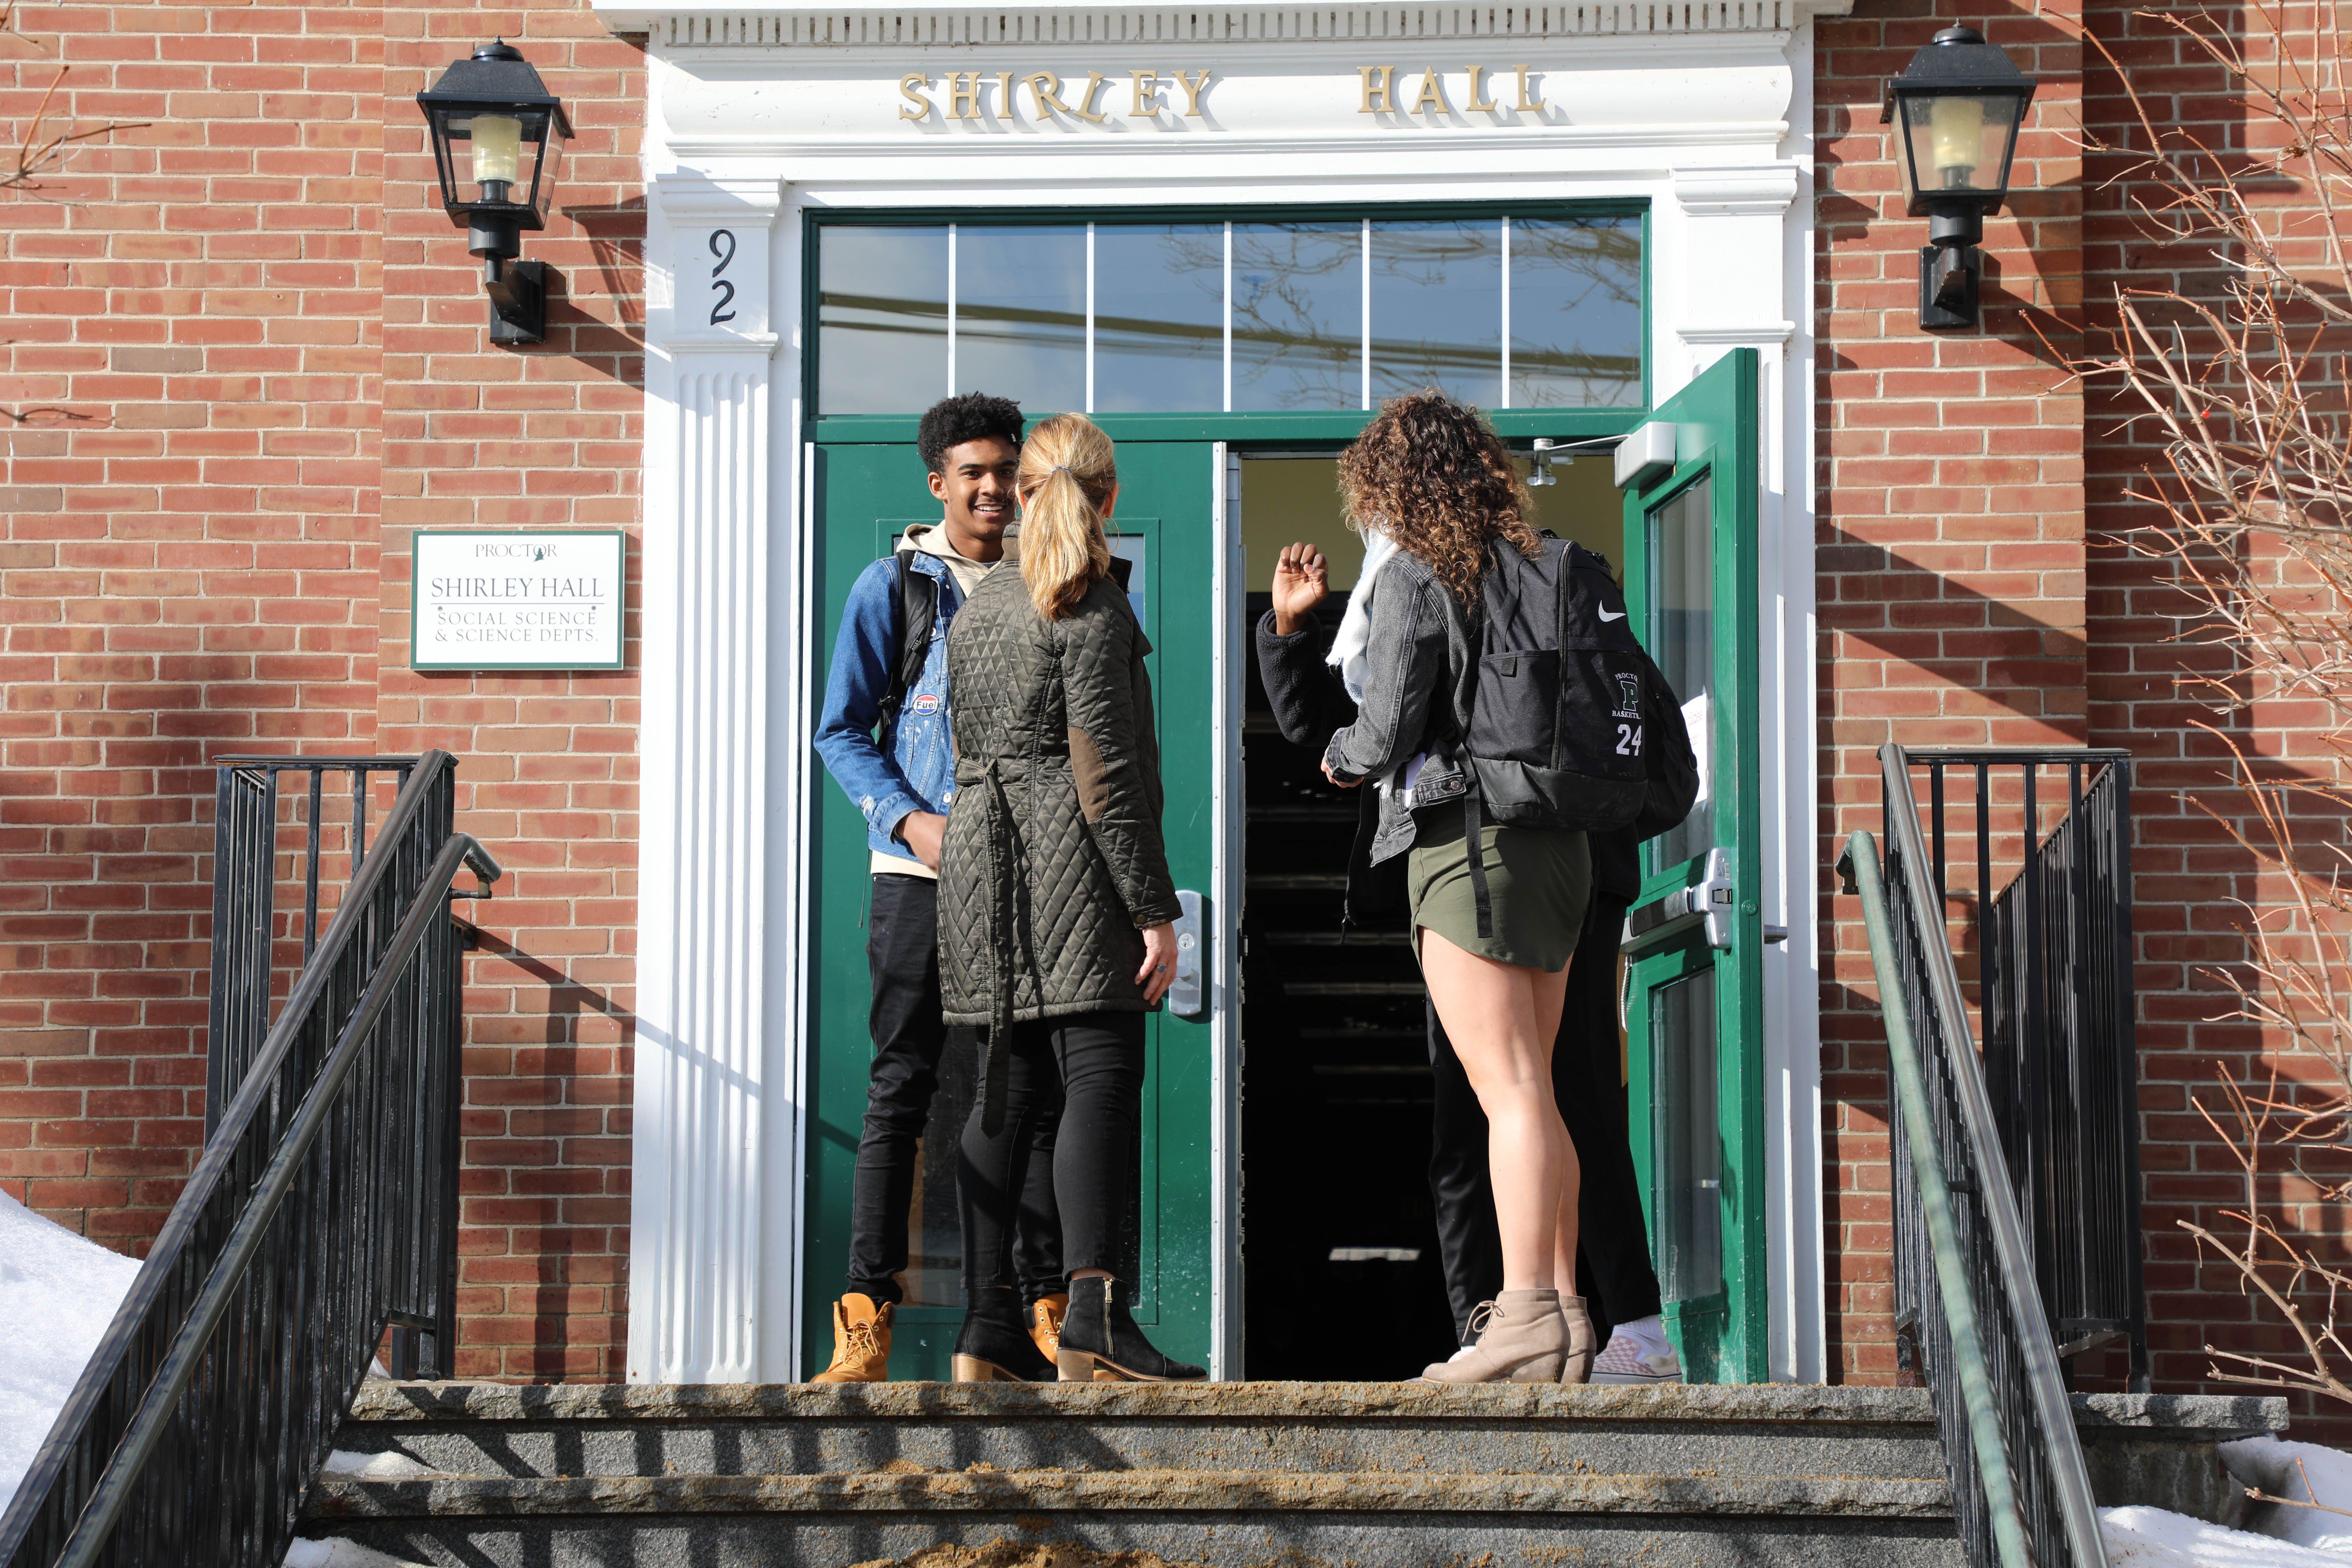 Proctor Academy educational model boarding school new england